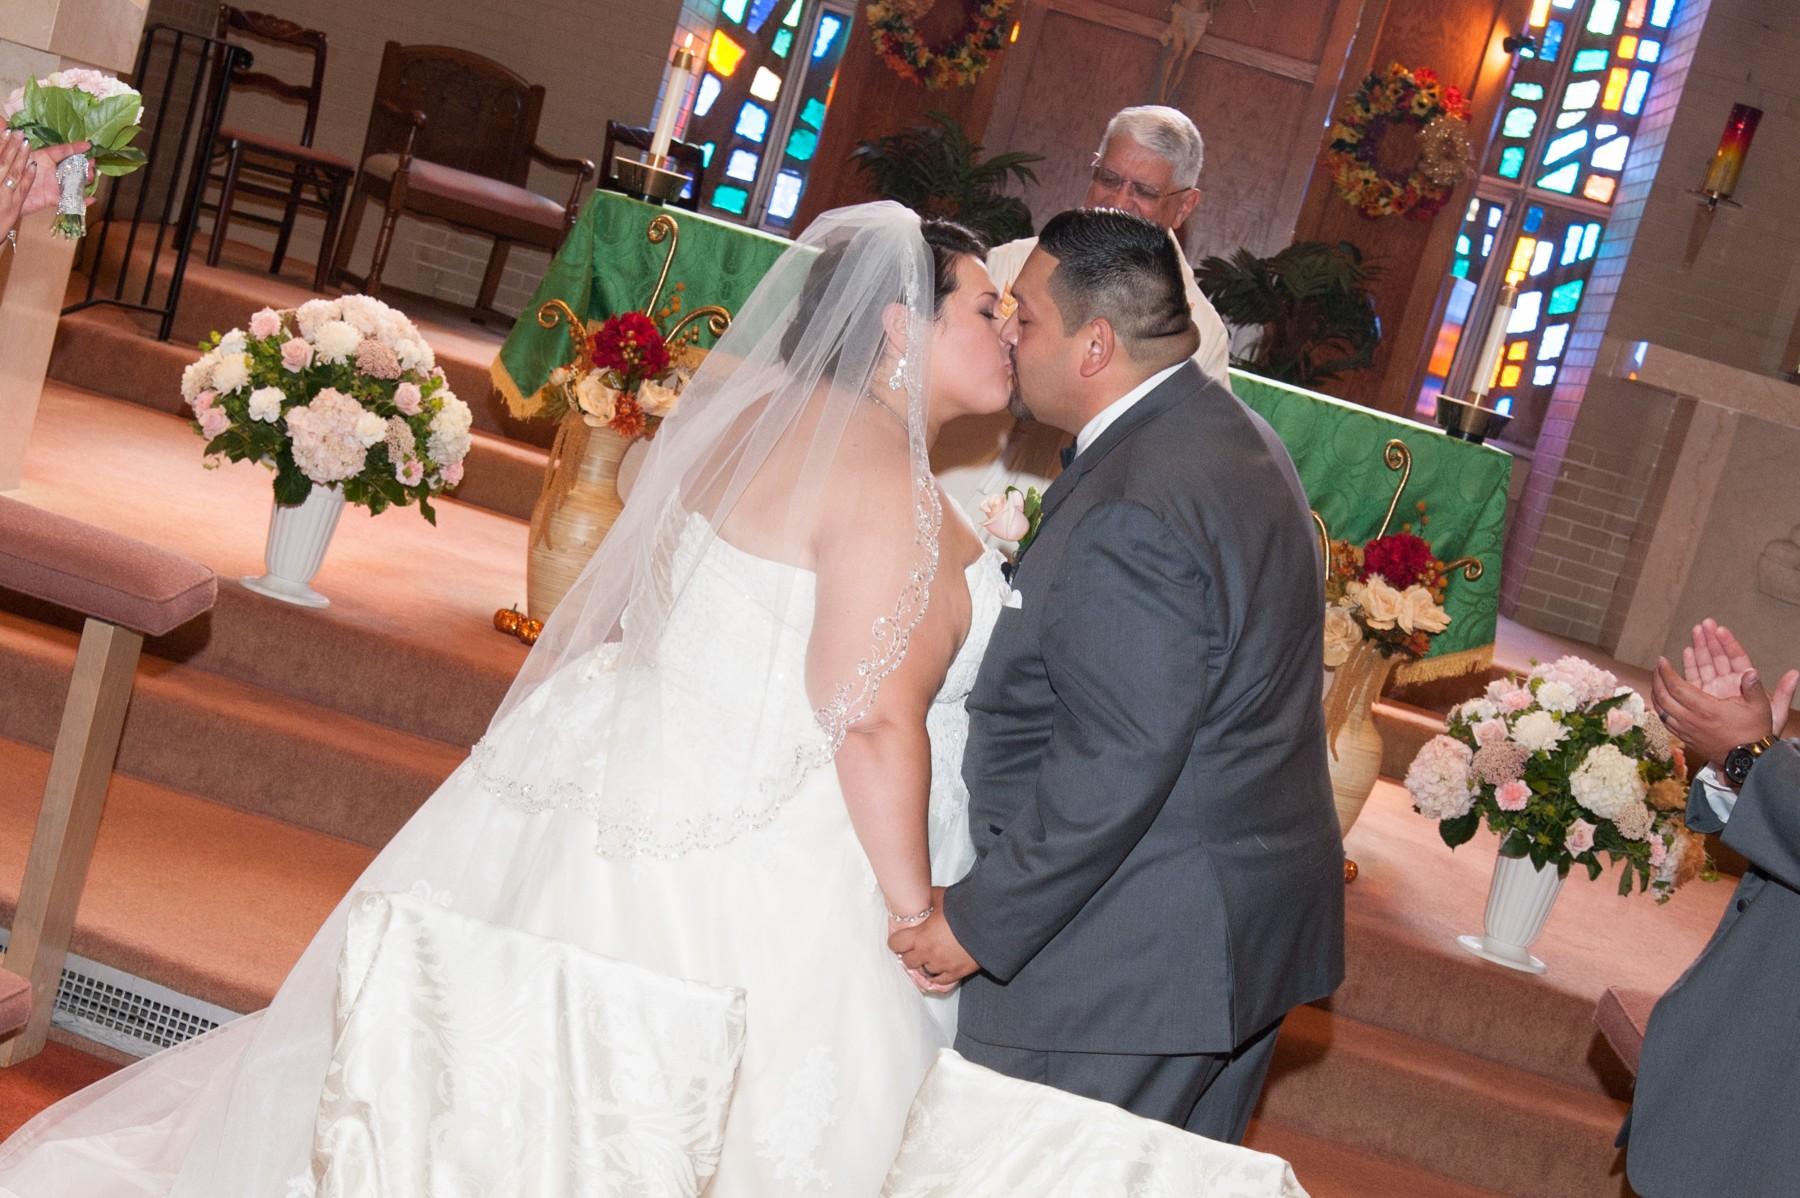 BridesbyYoung-RealBride-PlusSizeCurvyWeddingDress-MargieMichael-32.jpg